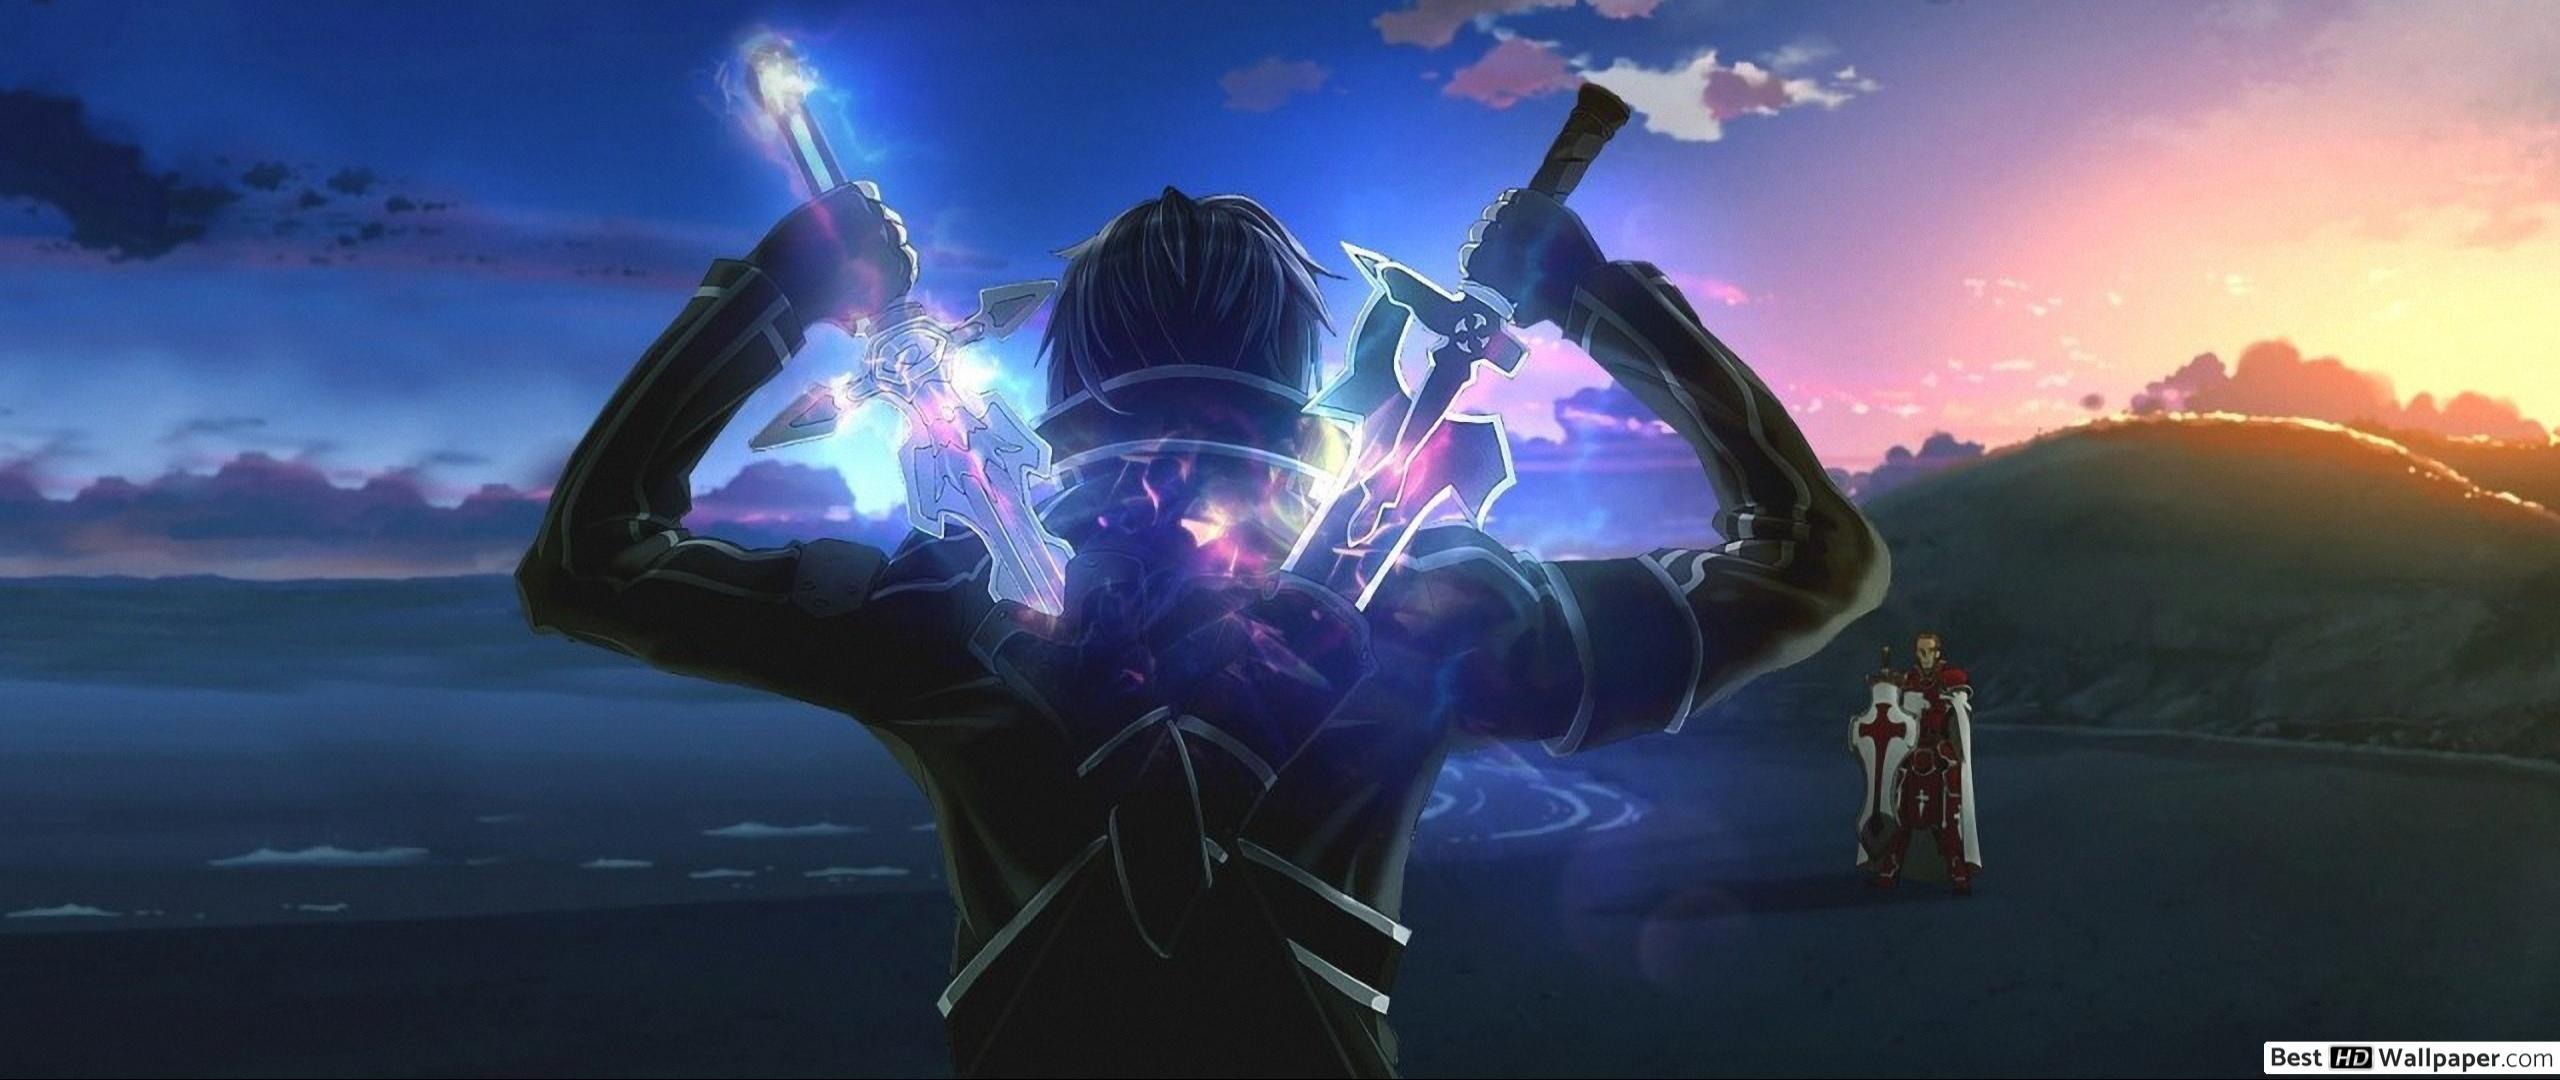 Sword Art Online Kirito Wallpaper Posted By Sarah Mercado